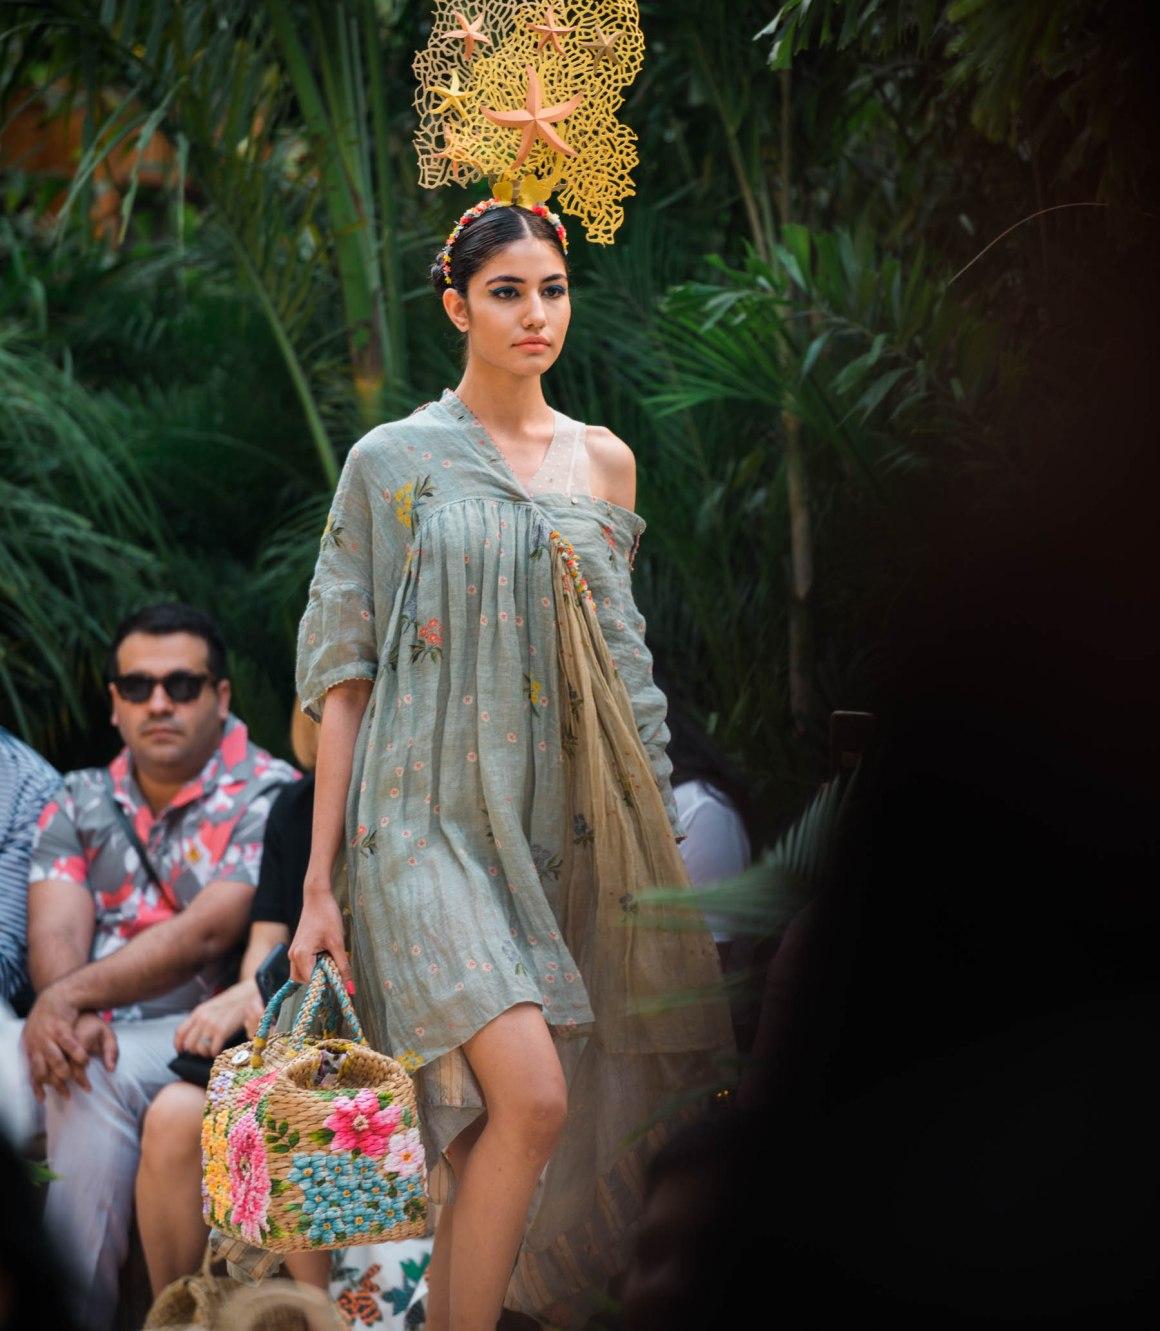 Naina Redhu, Naina.co, Pero, Aneeth Arora, Fashion Designer, FDCI, Lotus MakeUp India Fashion Week Spring Summer 2019, LMIFWSS19, LMIFW, India Fashion Week, Fashion Week Delhi, MadeInIndia, Made In India, EyesForFashion, Professional Photographer, Blogger, Fashion Photographer, Lifestyle Photographer, Luxury Photographer, Delhi Photographer, Gurgaon Photographer, Delhi Blogger, Gurgaon Blogger, Indian Blogger